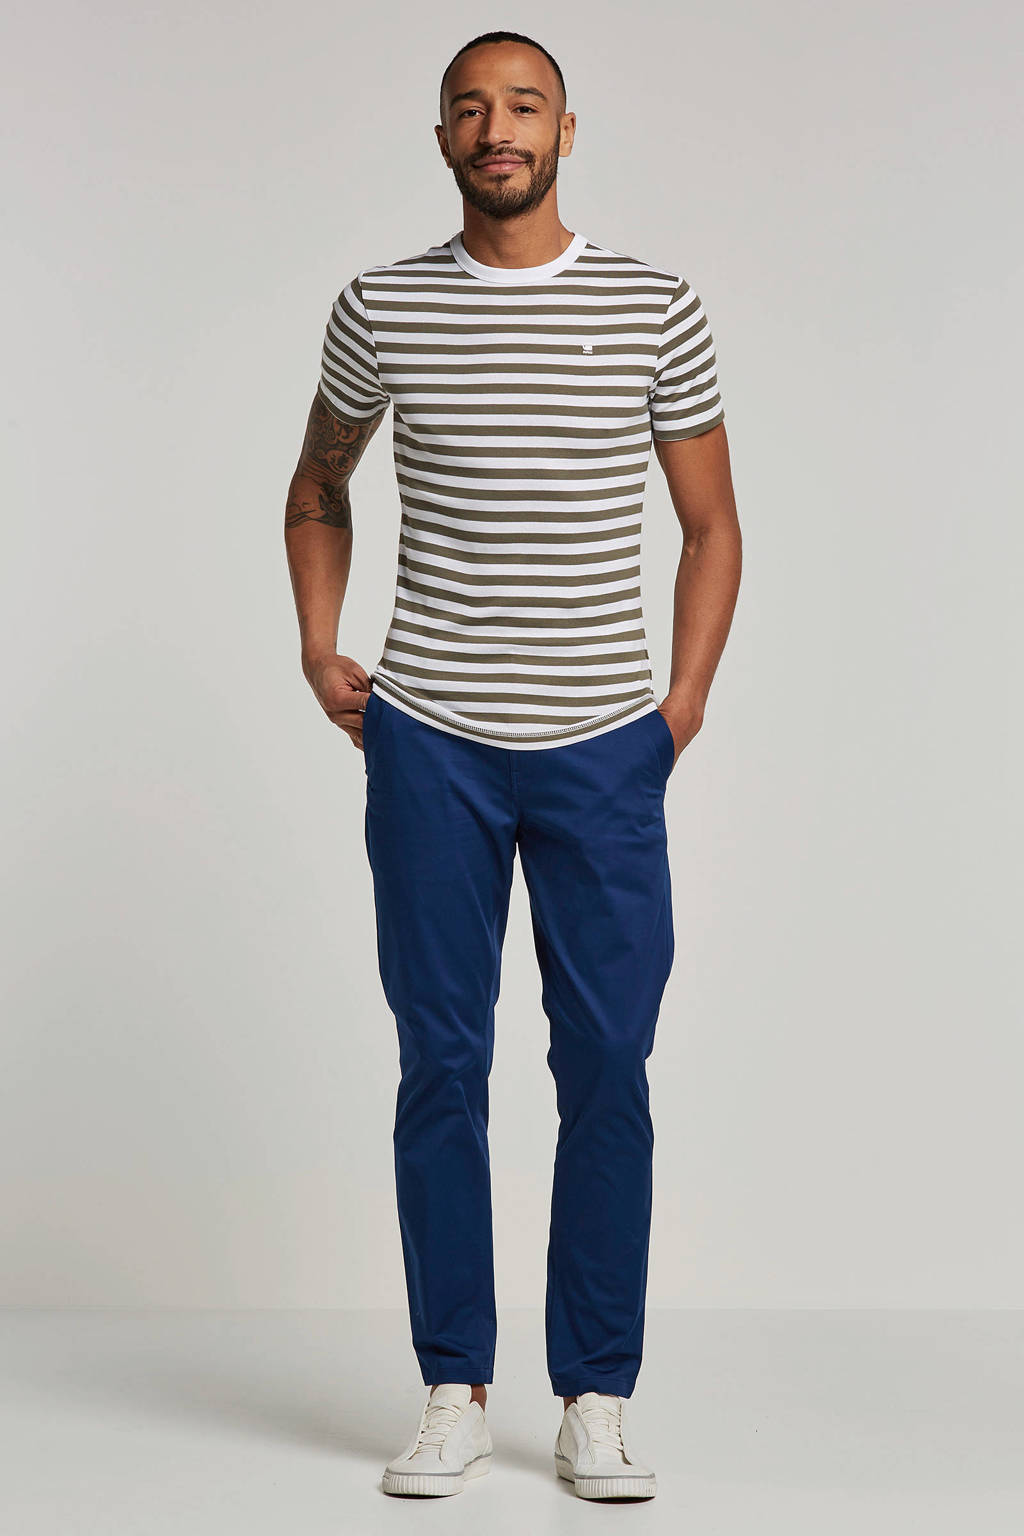 G-Star RAW T-shirt Kantano, Wit/groen